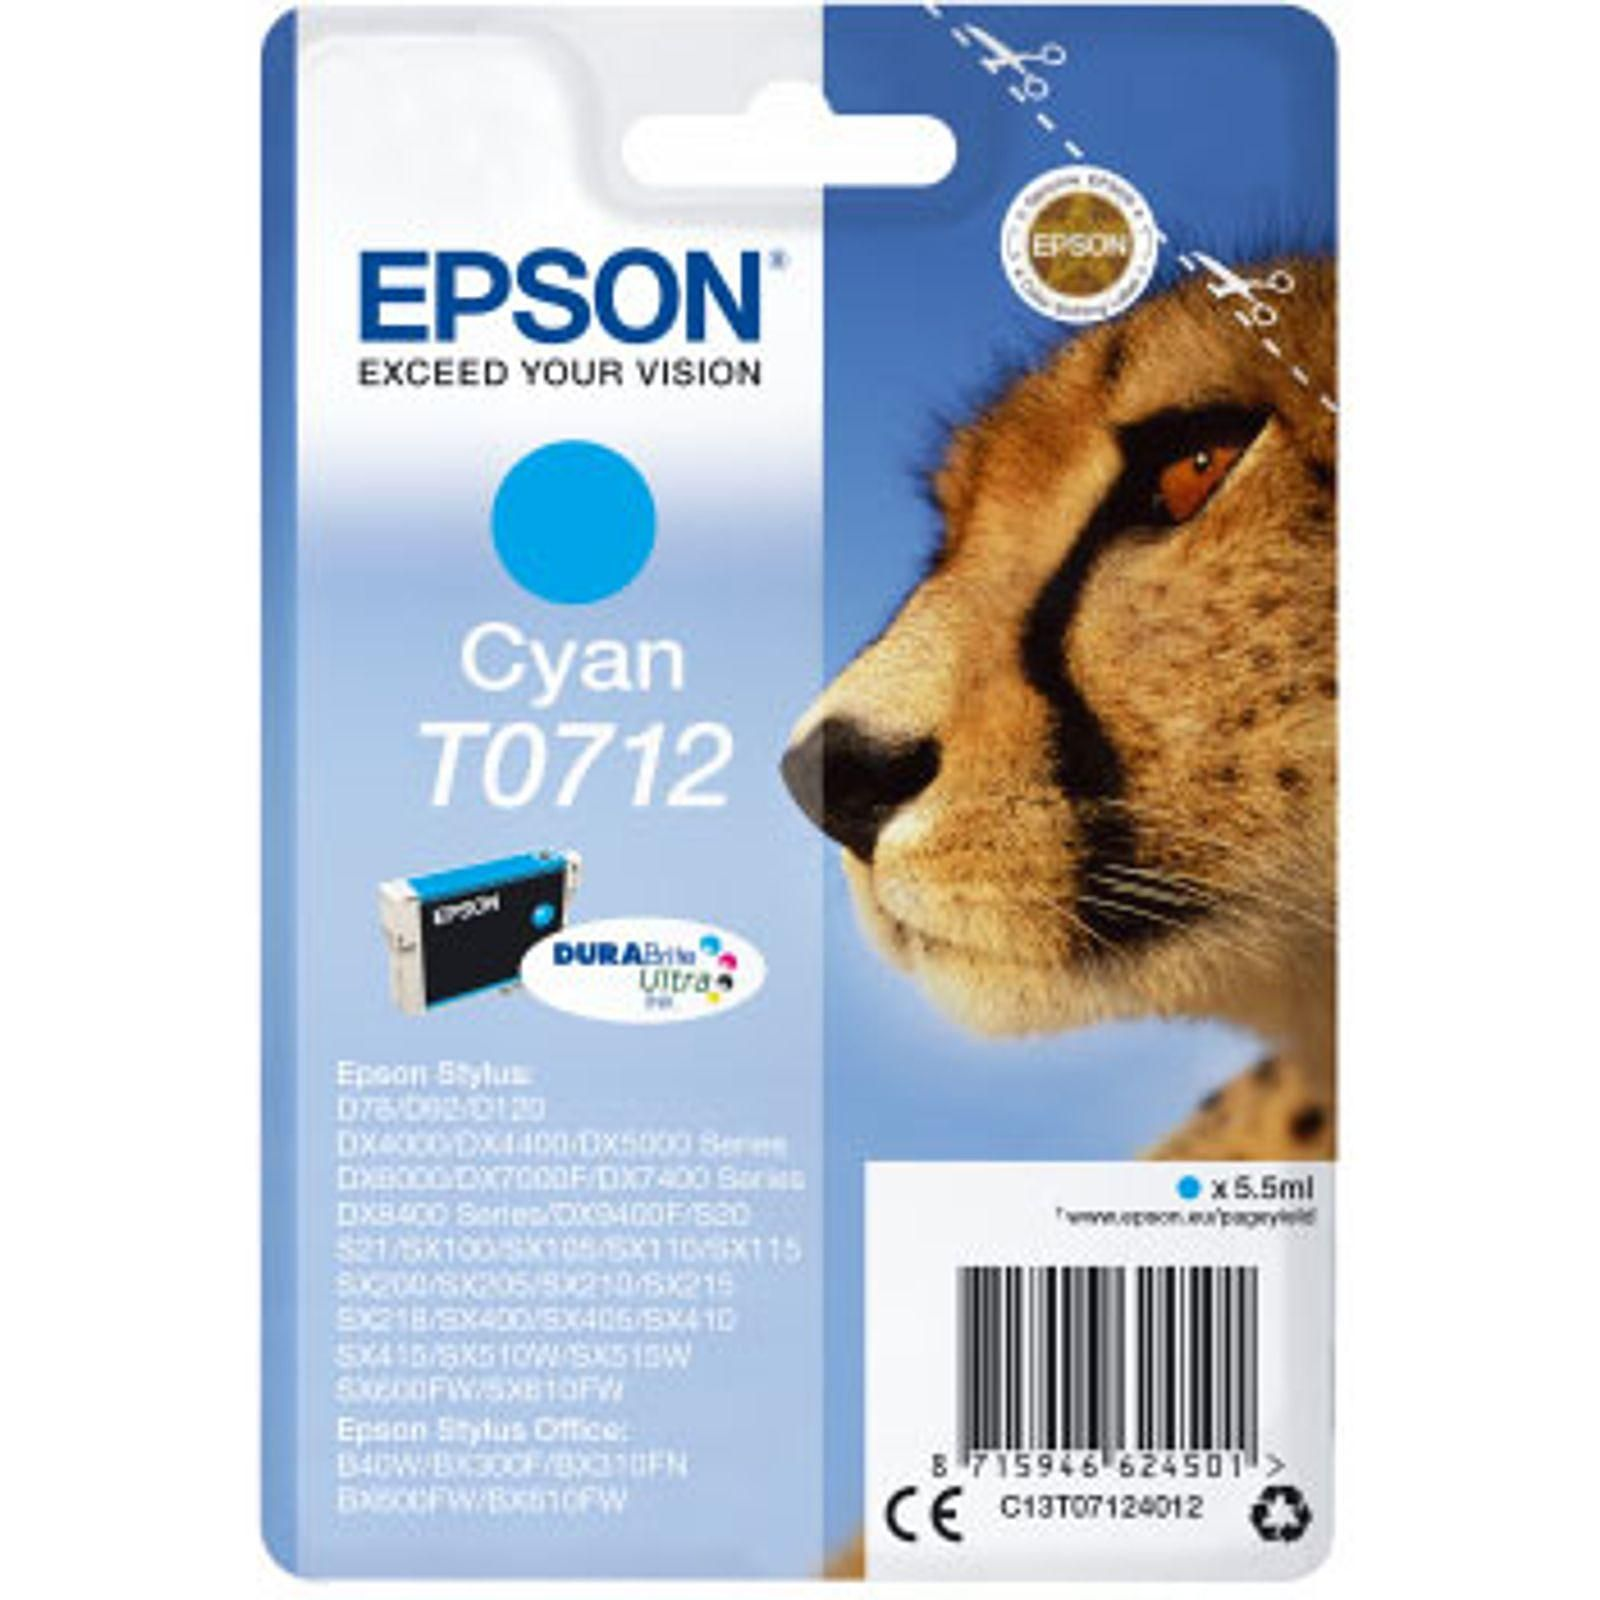 Cartouche d'encre cyan Epson